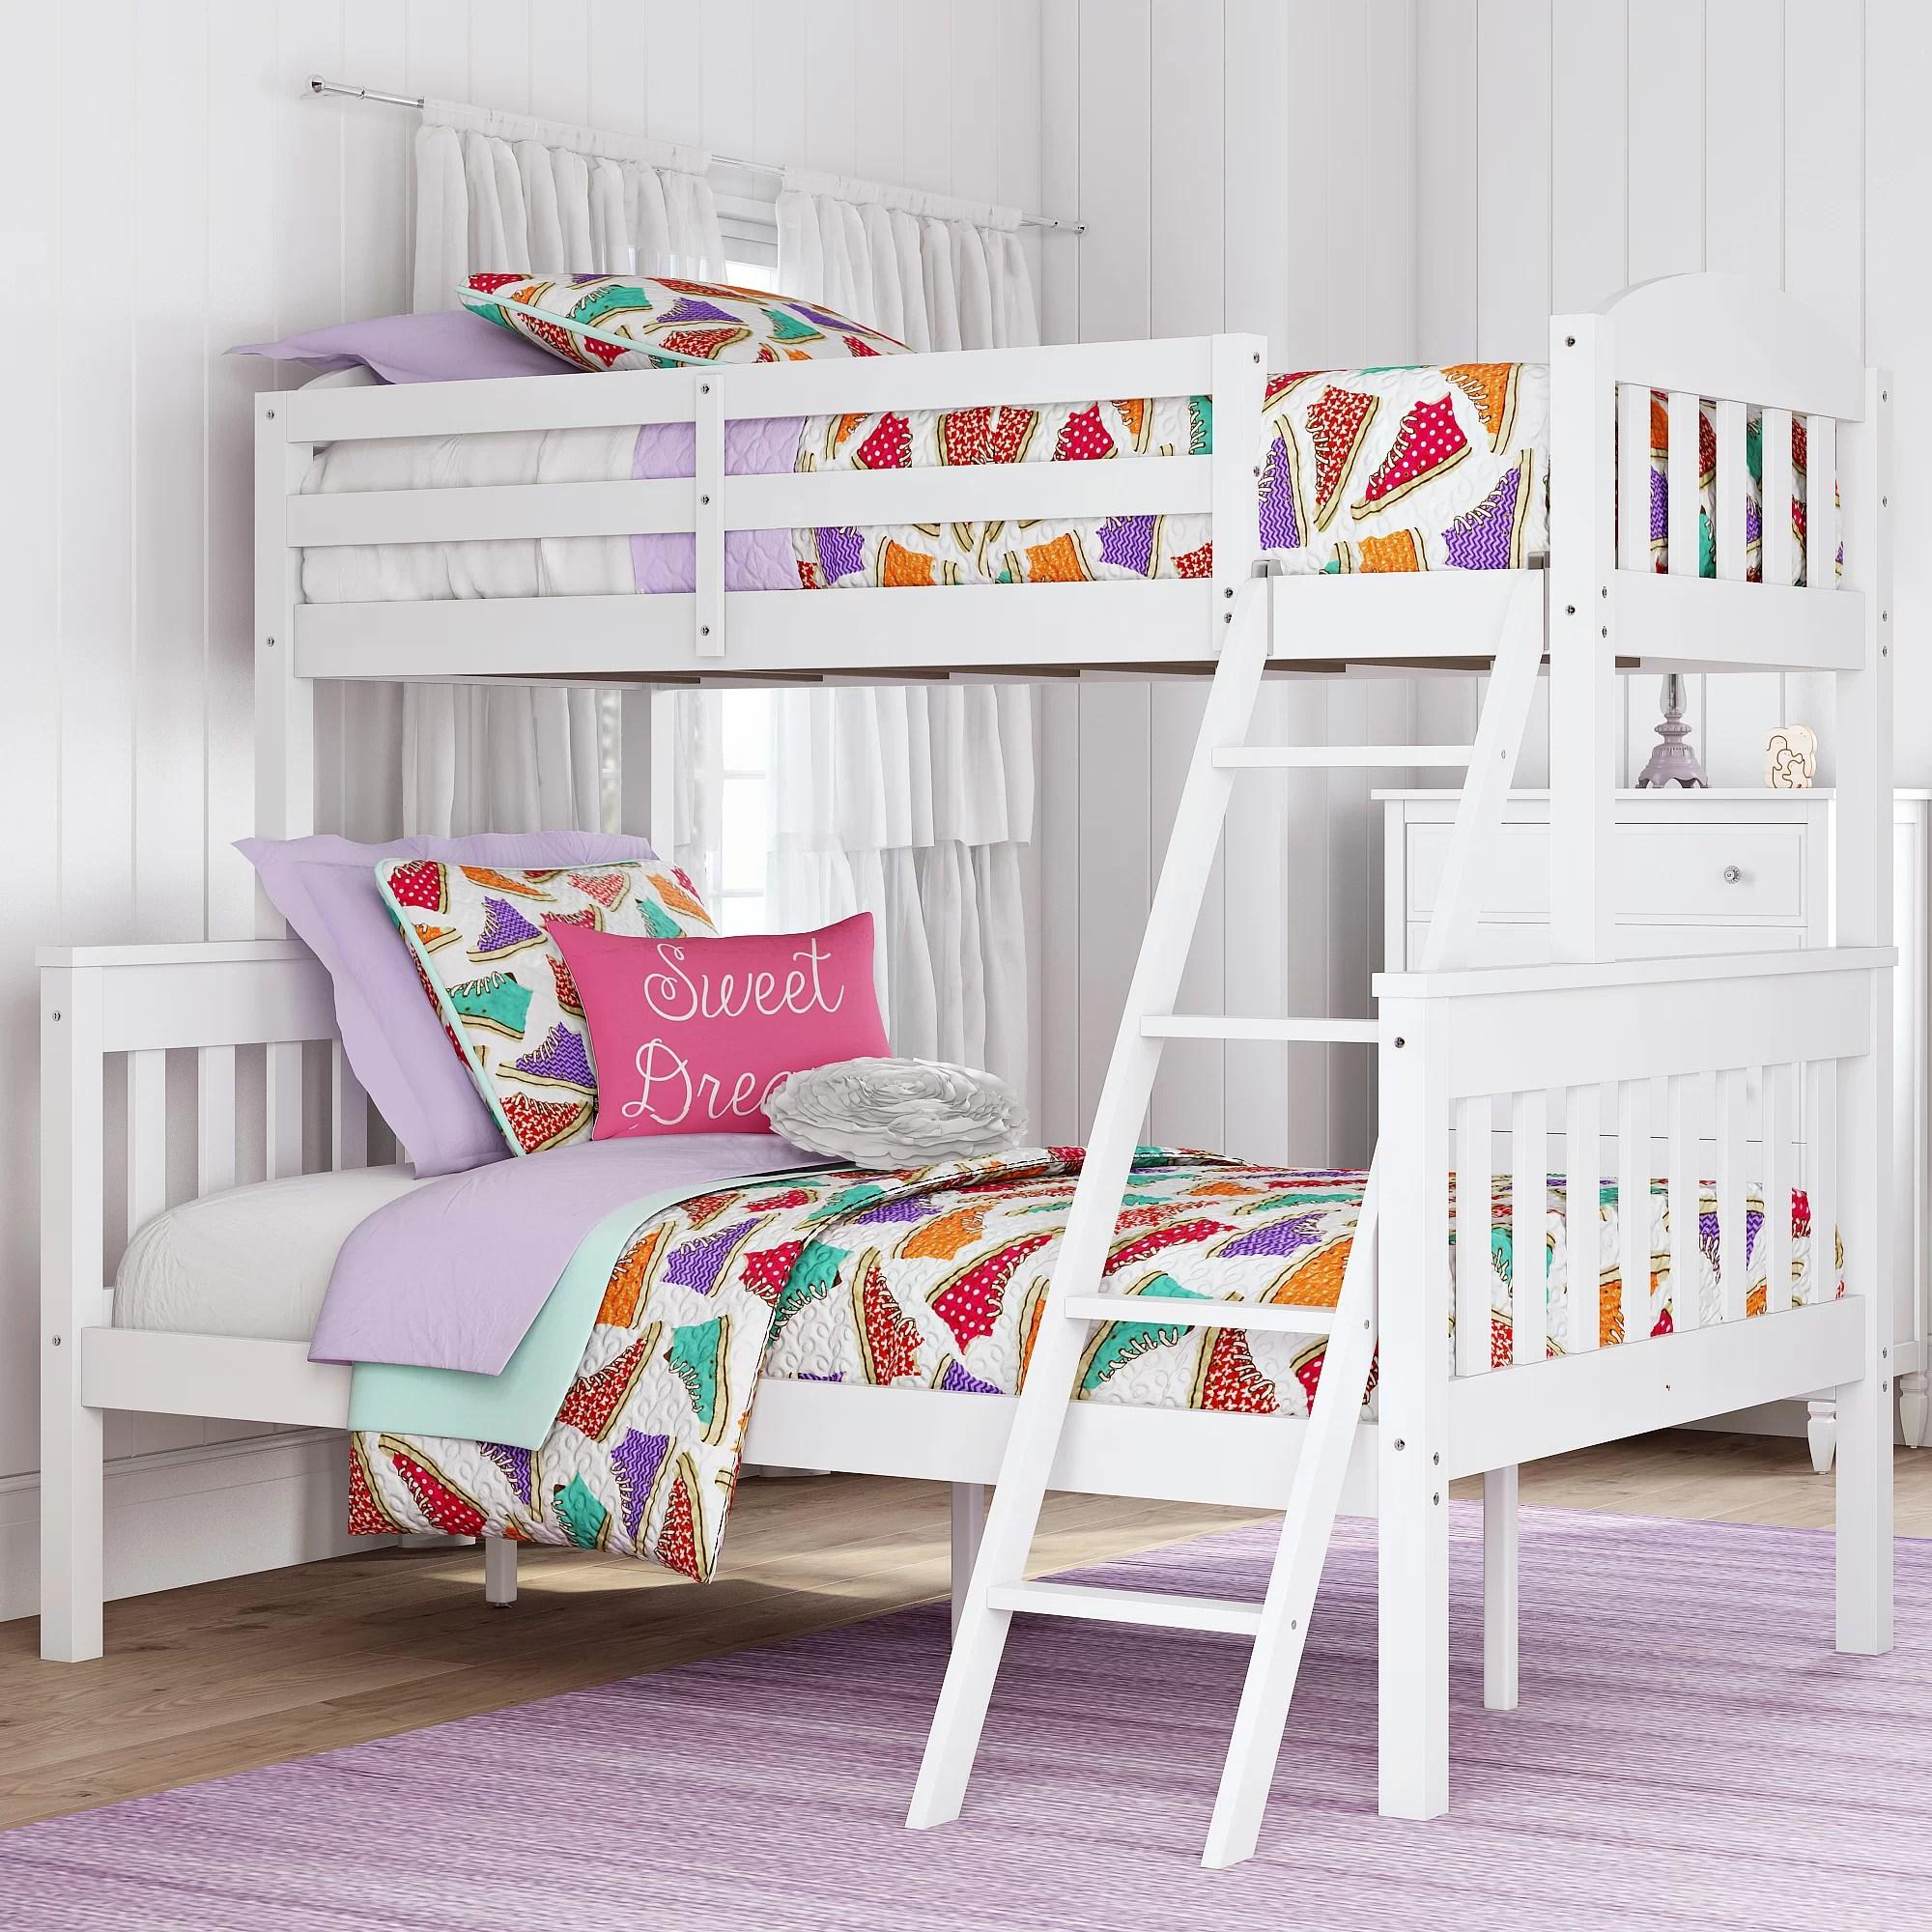 Bunk Beds Up To 60 Off Through 12 21